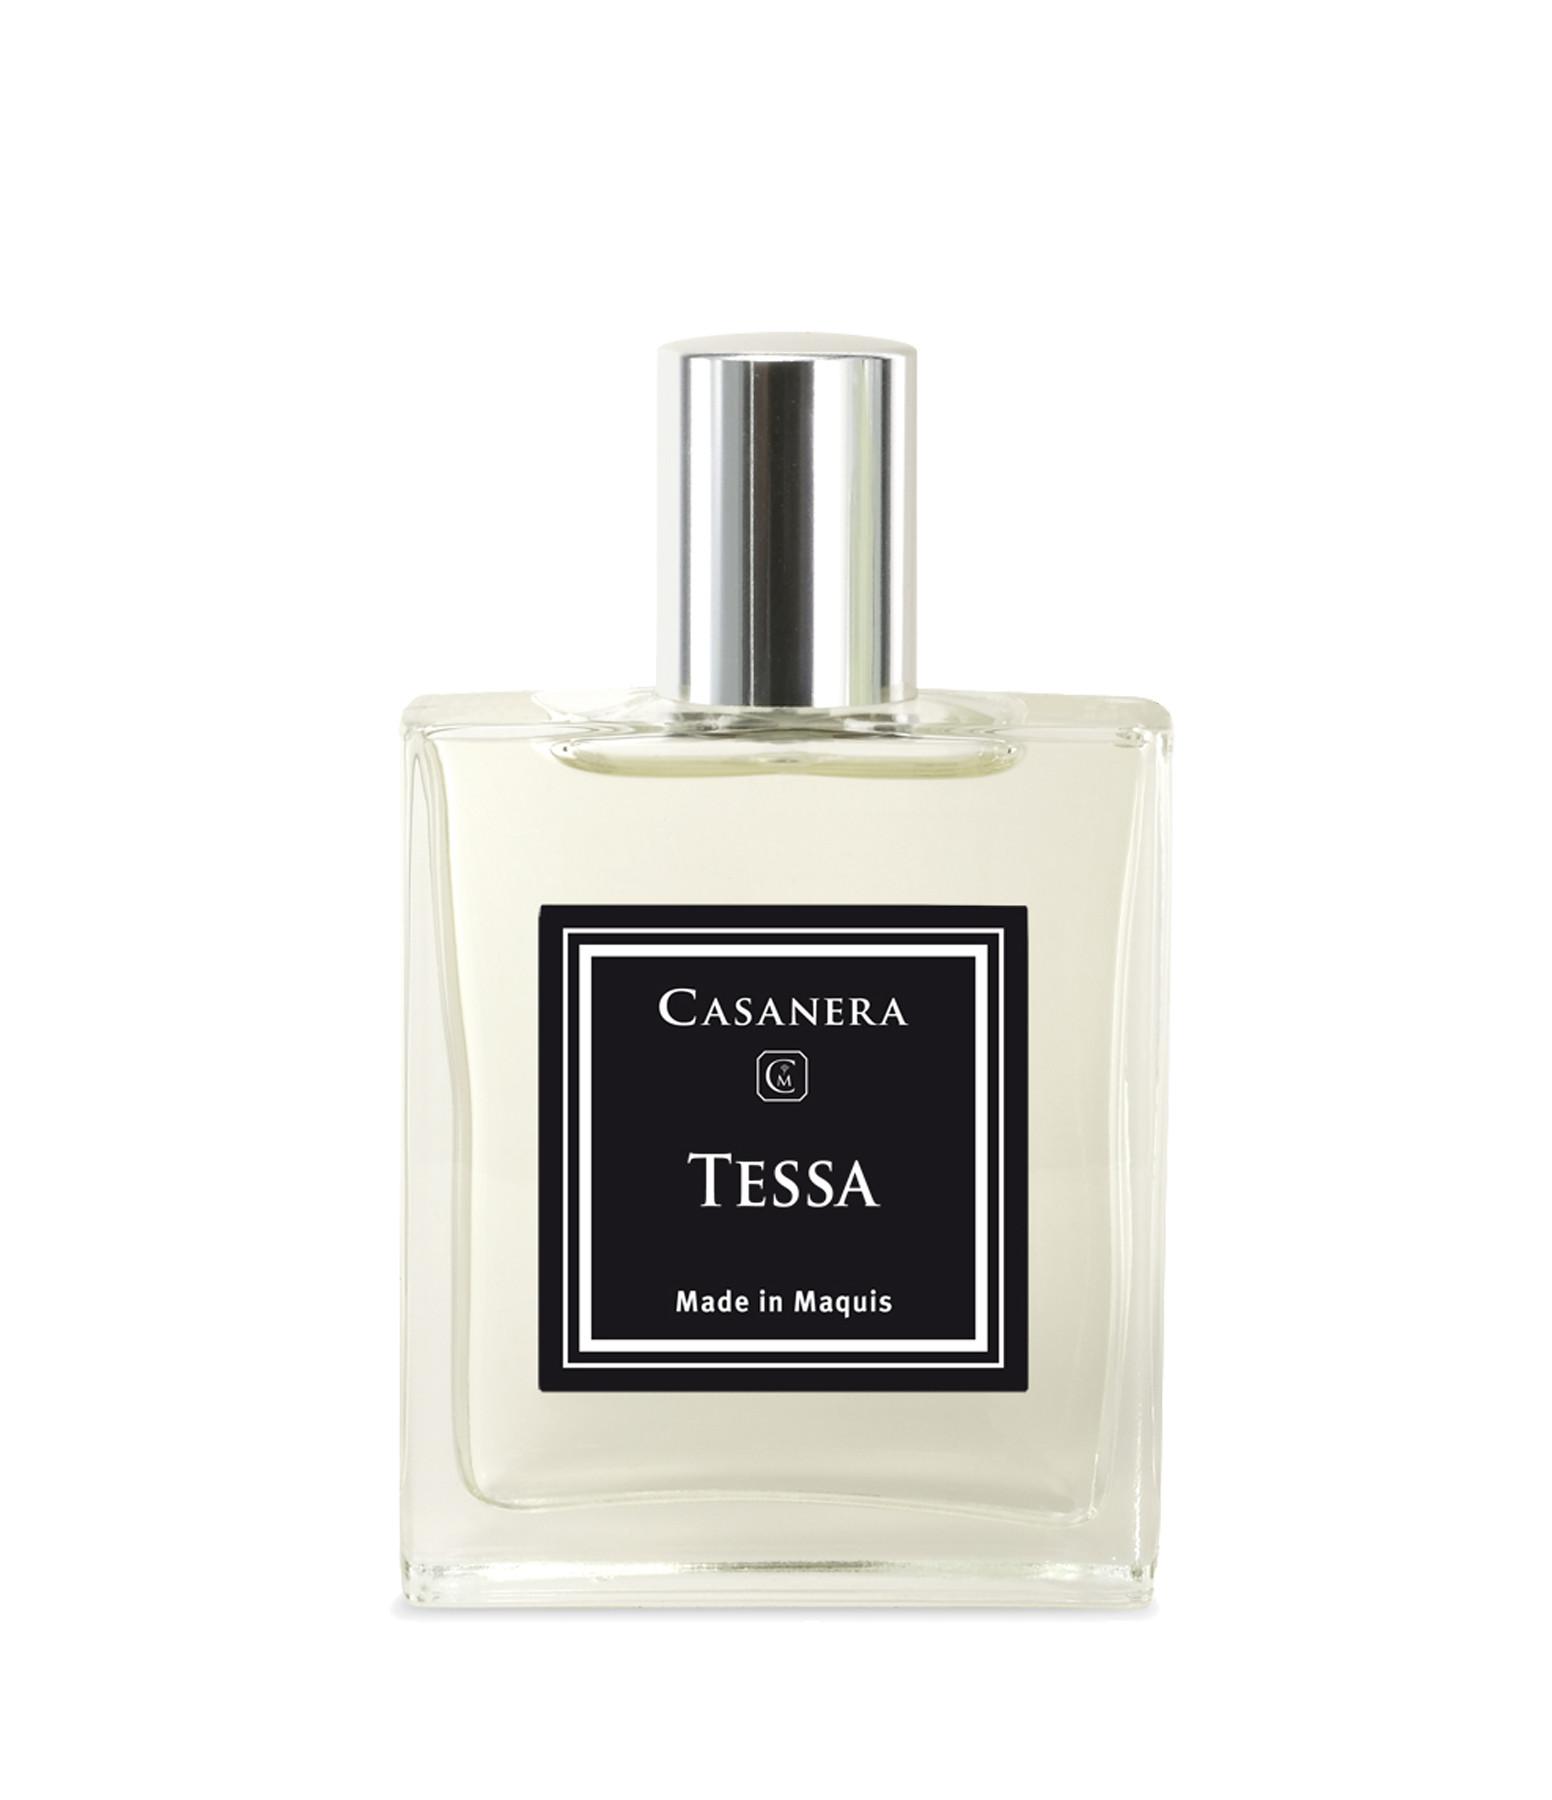 CASANERA - Eau de Parfum Tessa 50ml